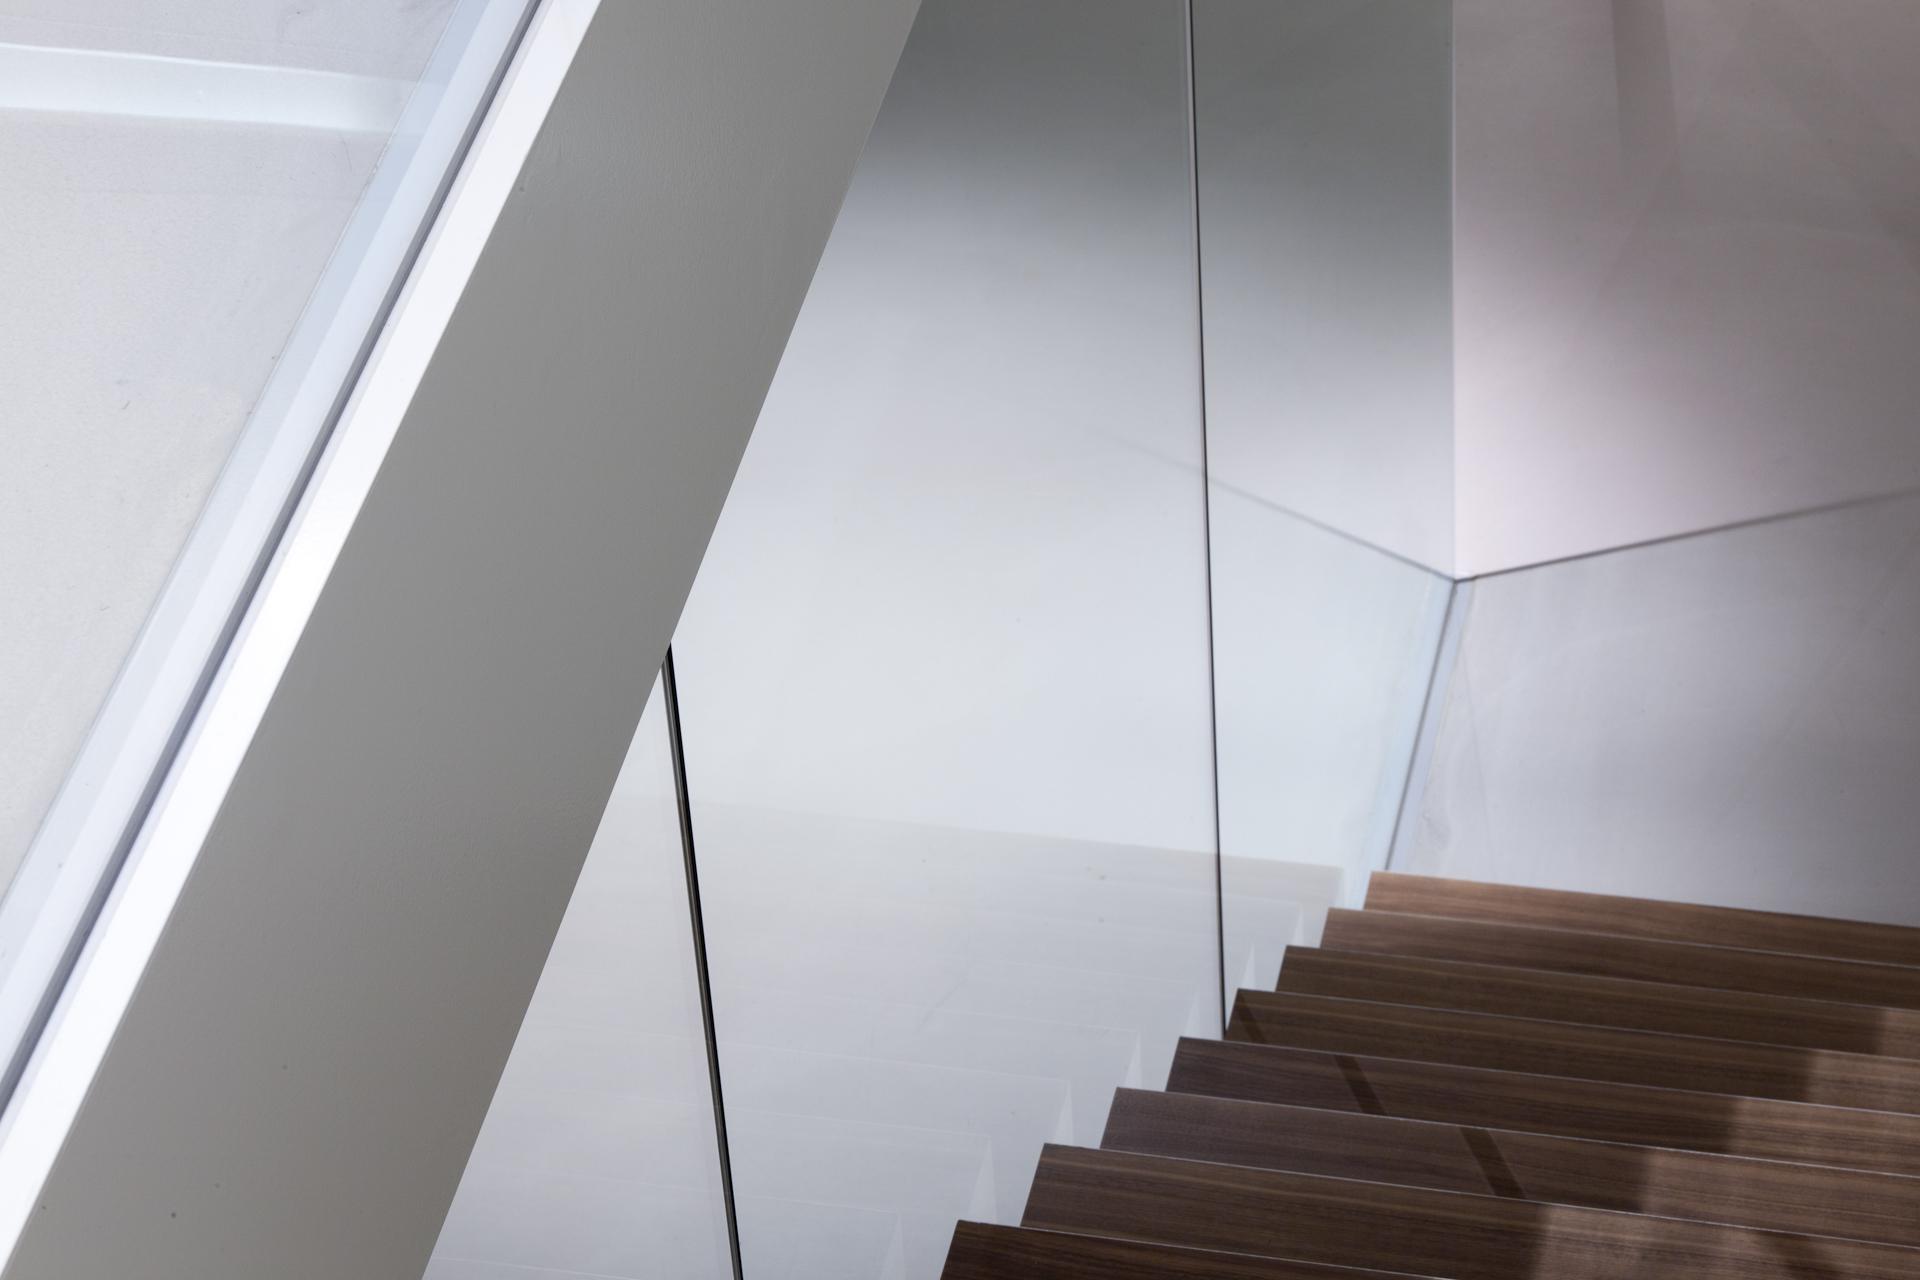 Peter_Leenders_Fotografie_Wrede_Architekten-6